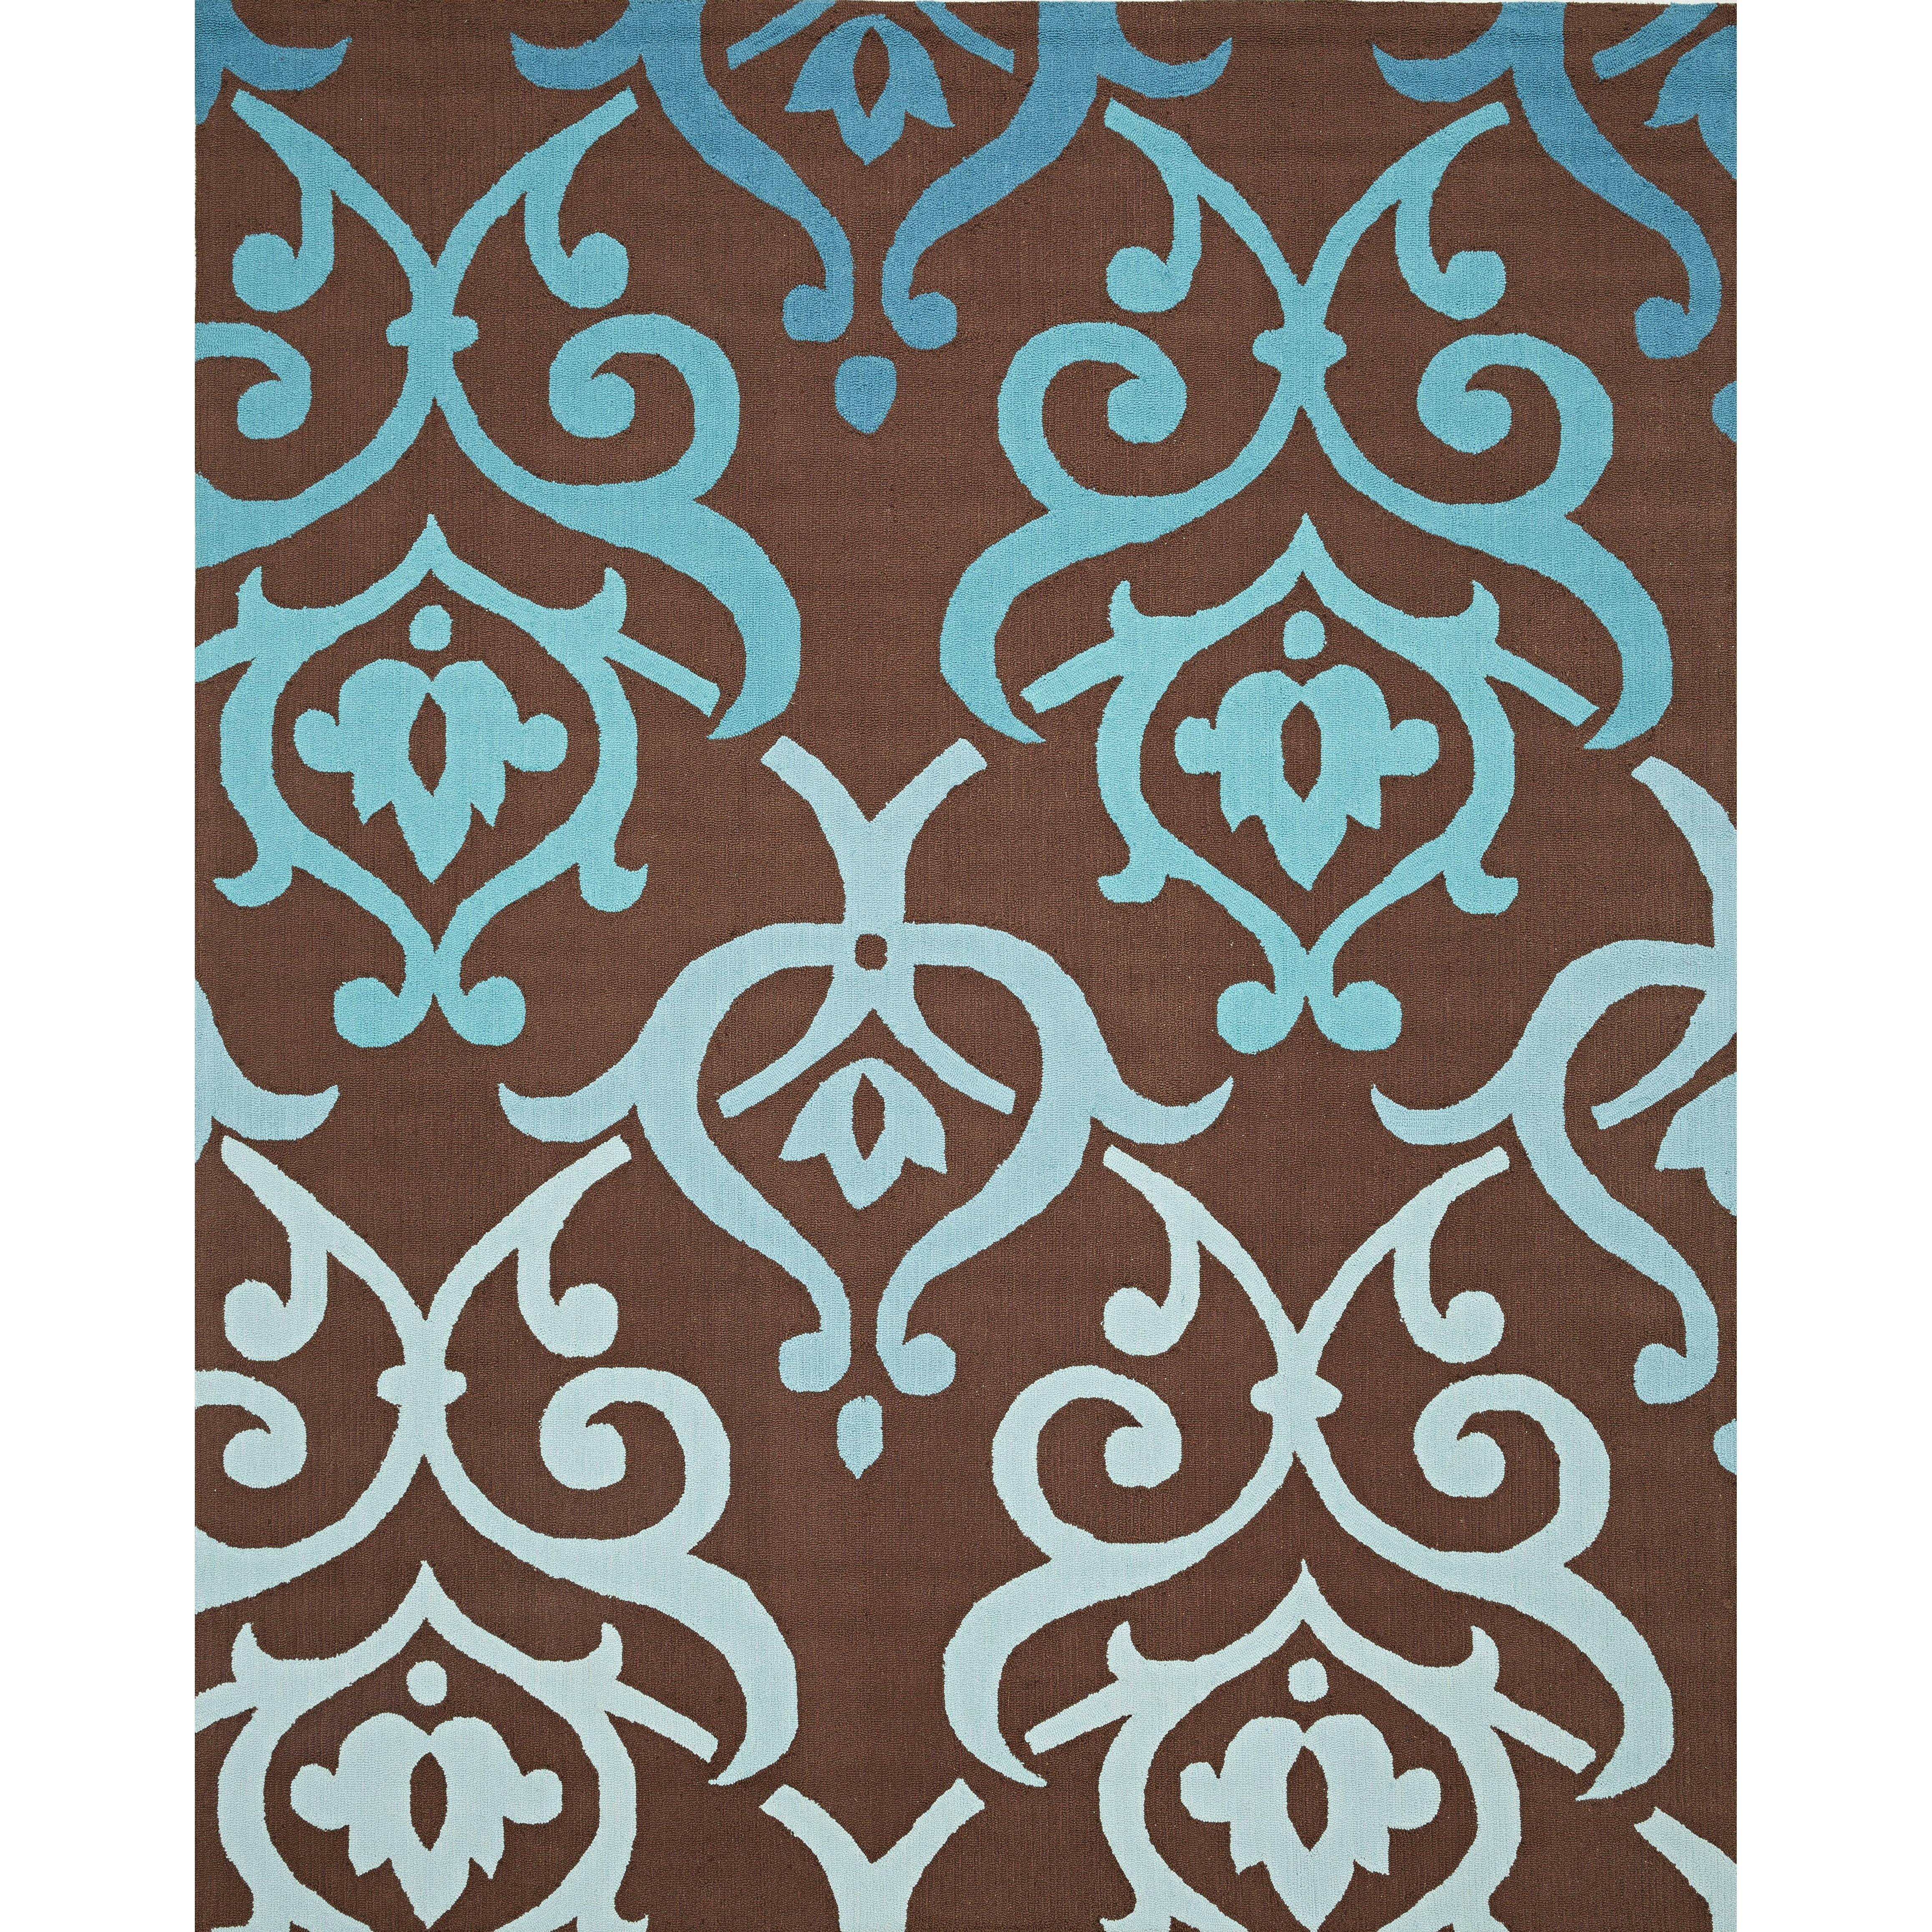 InnerSpace Luxury Products Cosette Fleur De Lis Brown/Blue Rug